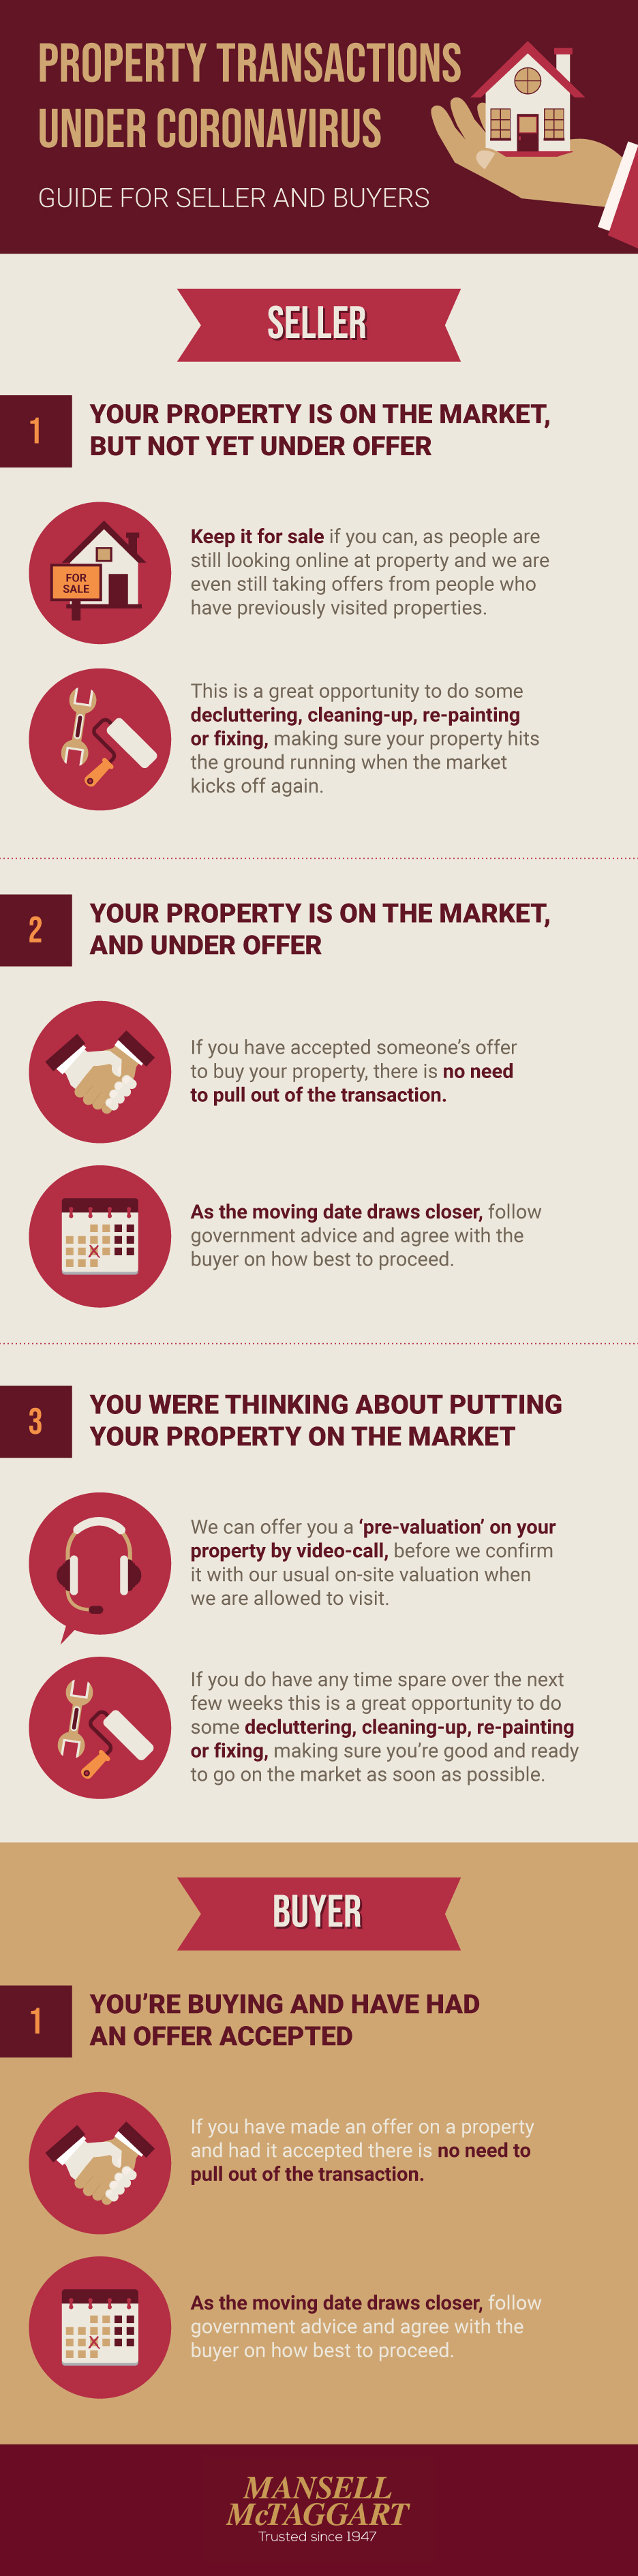 buying & selling property coronavirus